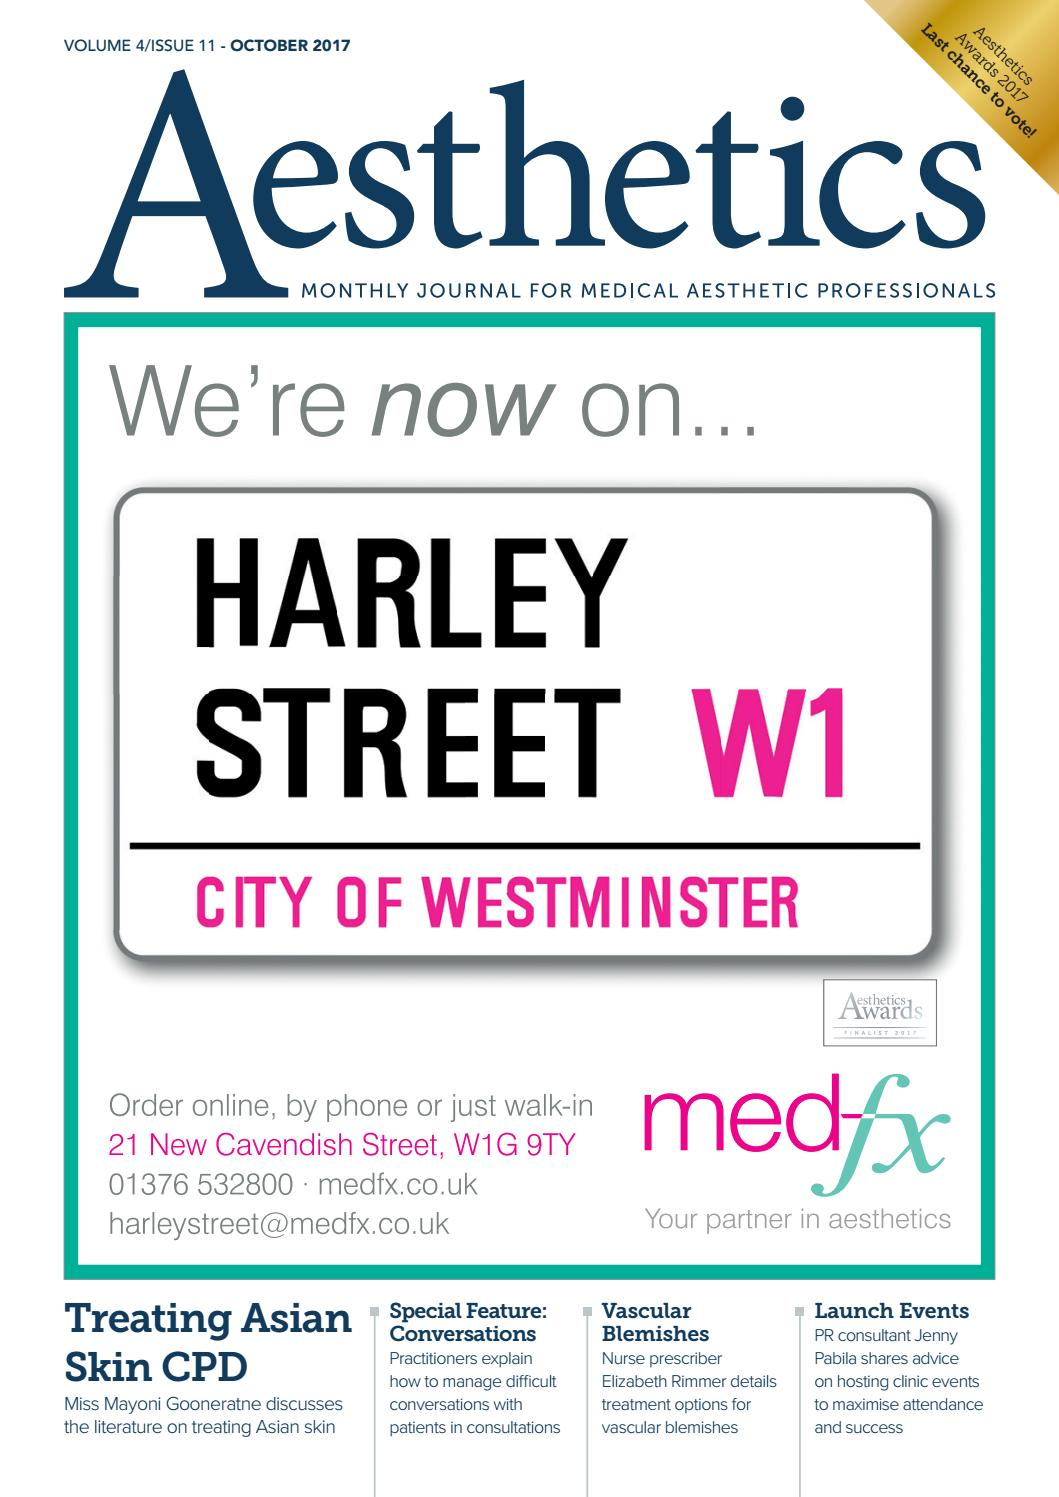 Aesthetics October 2017 by Aesthetics Journal - issuu